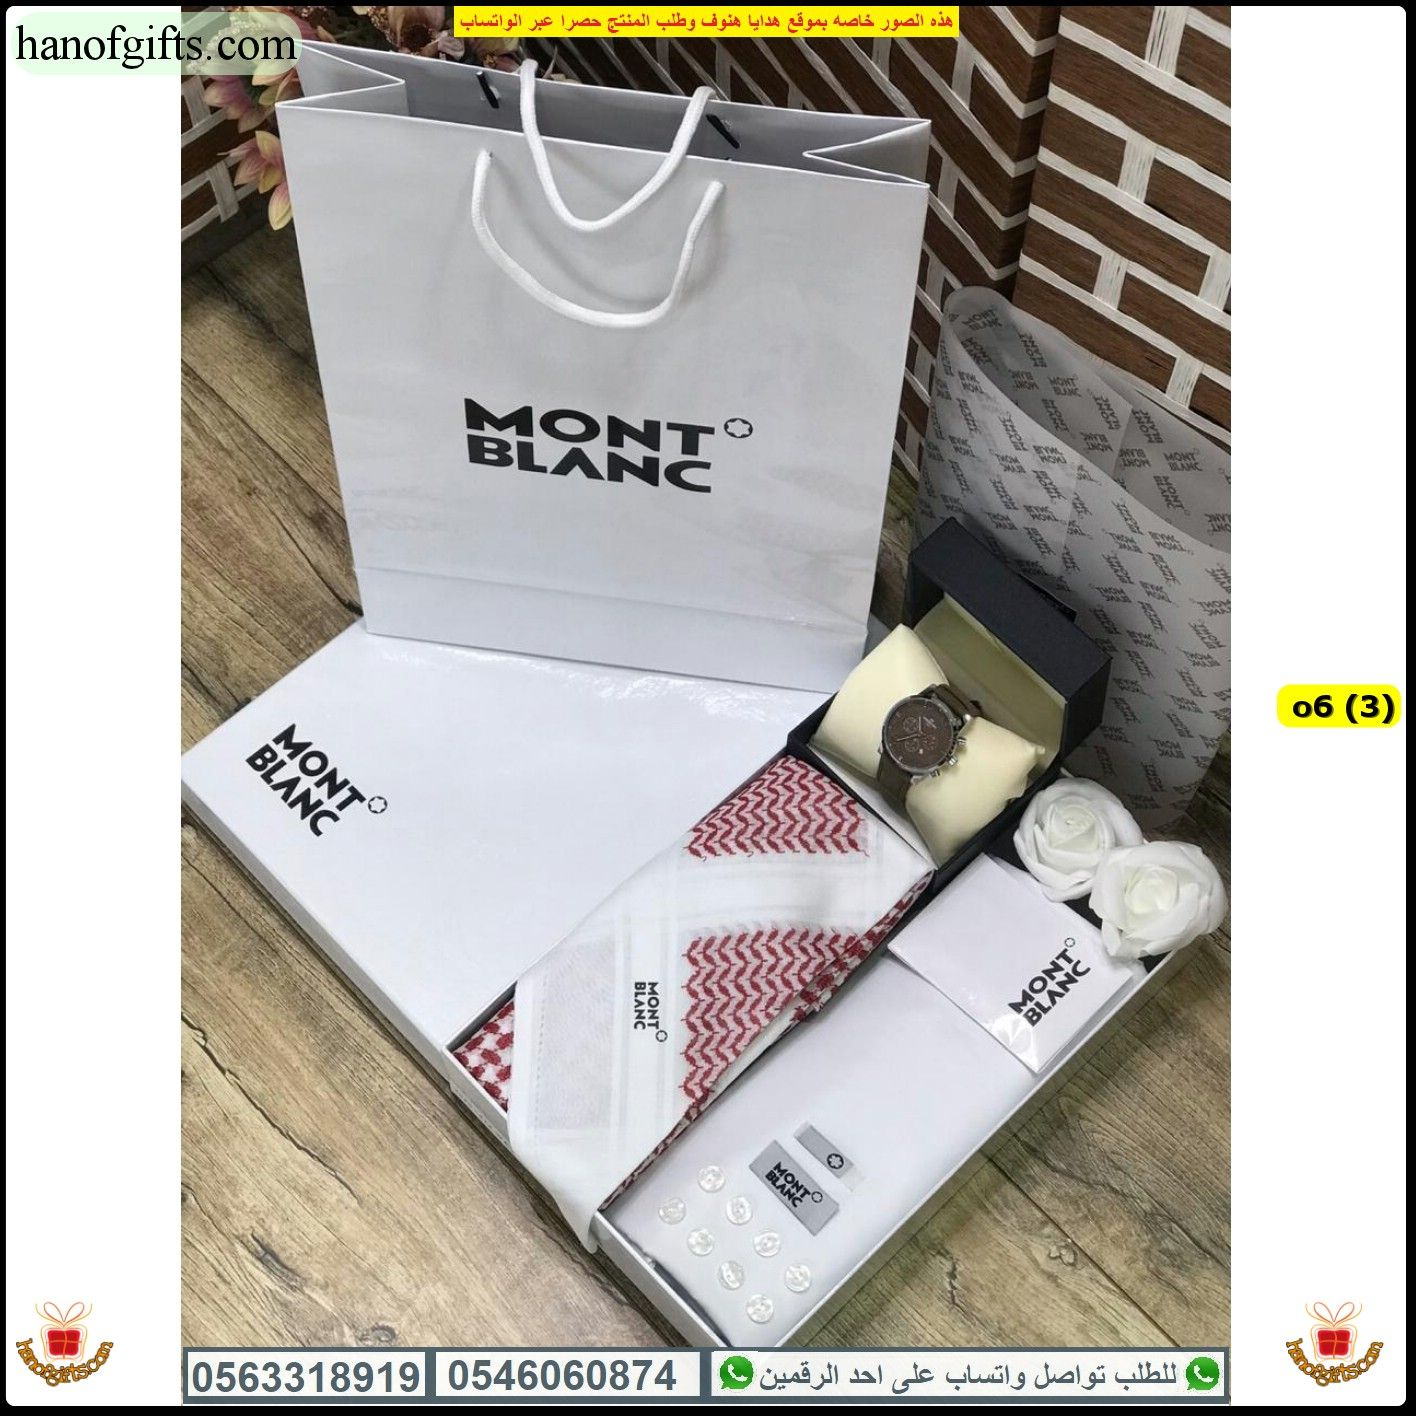 قماش مونت بلانك كوري 3 5 متر والعرض عرضين مع شماغ مونت بلانك وساعة هدايا هنوف Gifts Convenience Store Products Wrap